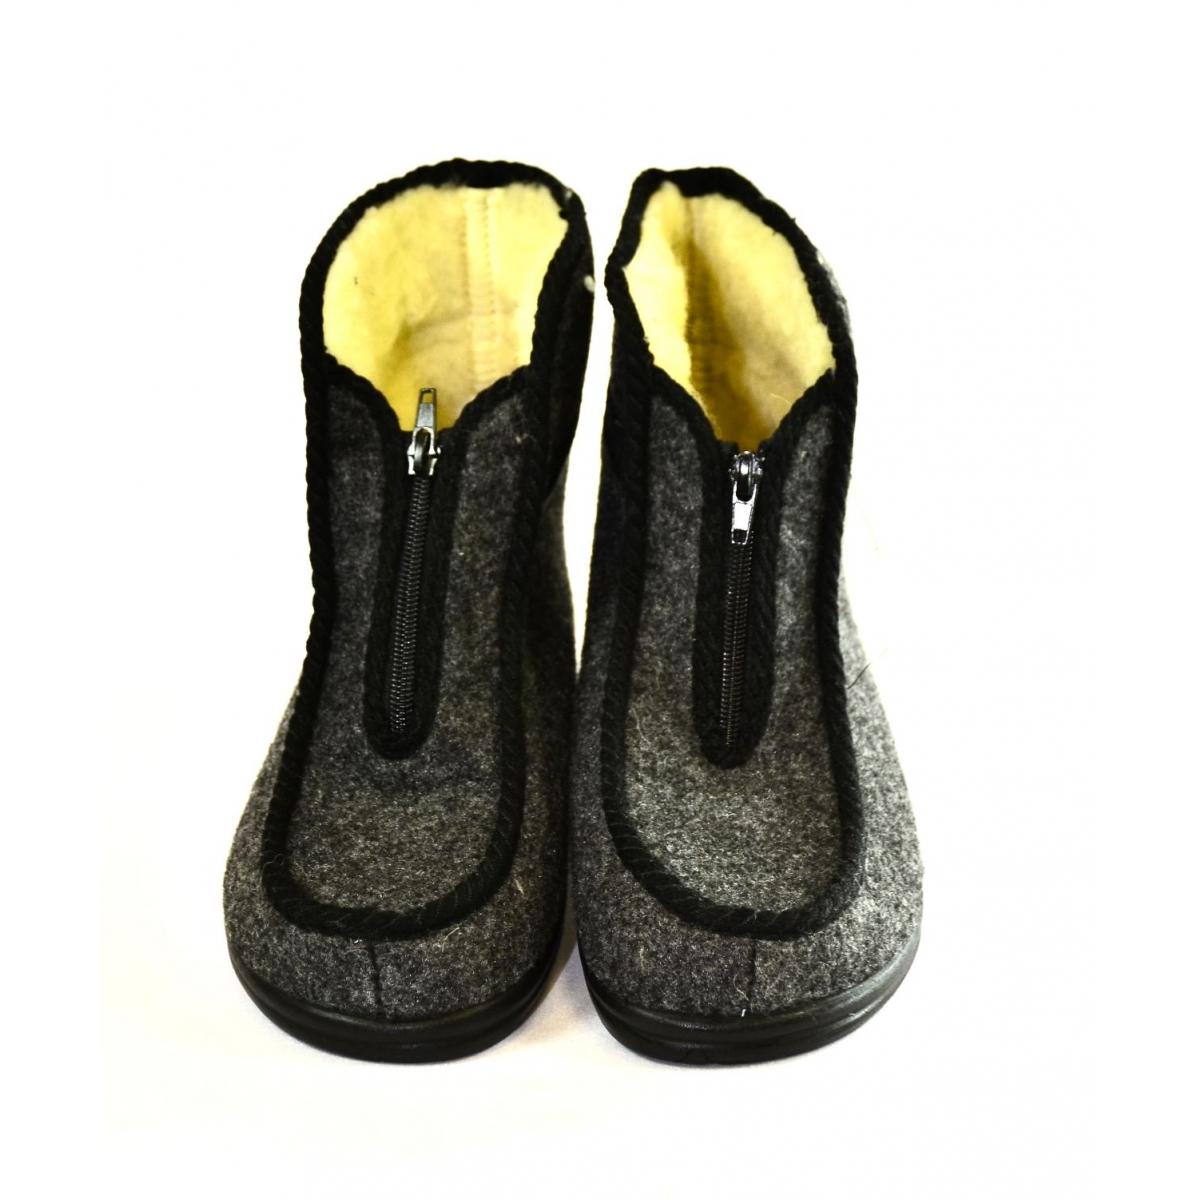 203a7773af718 Pánske sivé papuče TEO | Johnc.sk